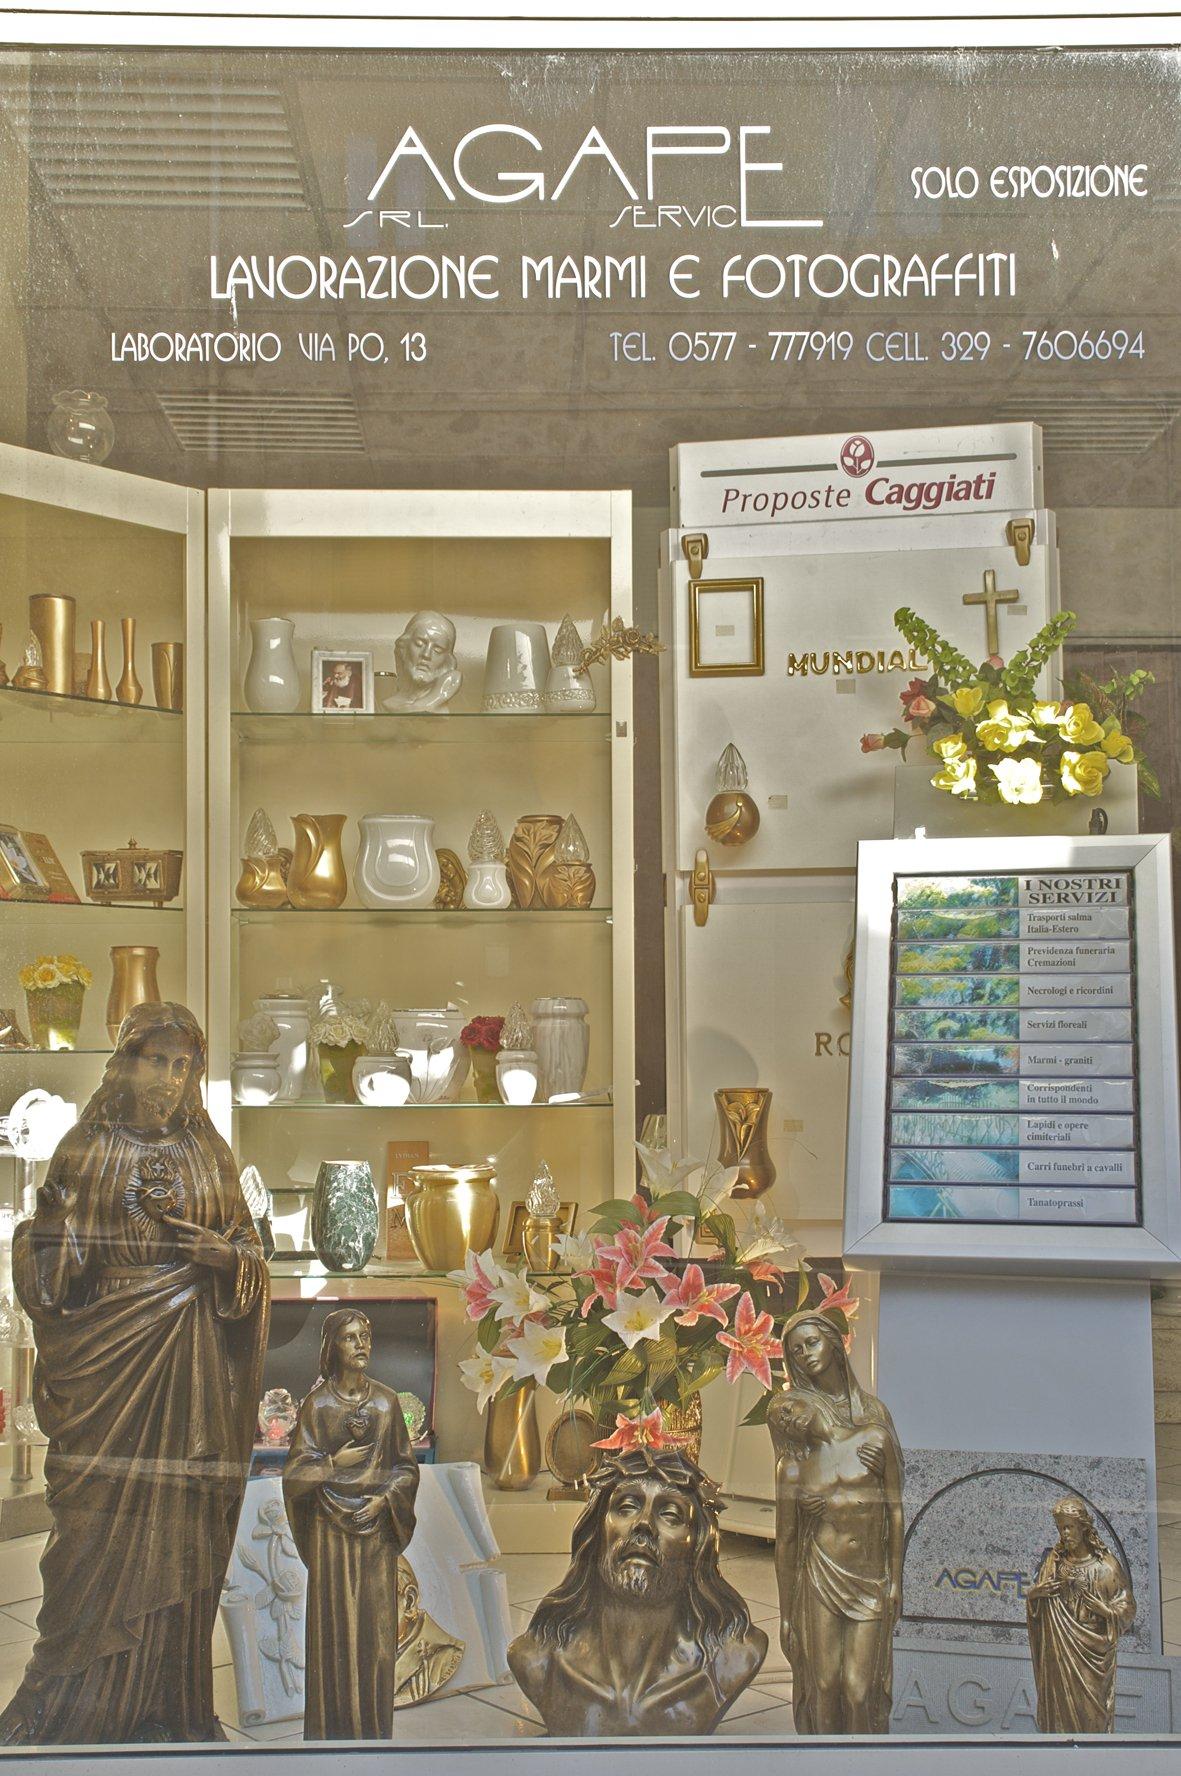 vetrina espositiva di Onoranze Funebri Agape